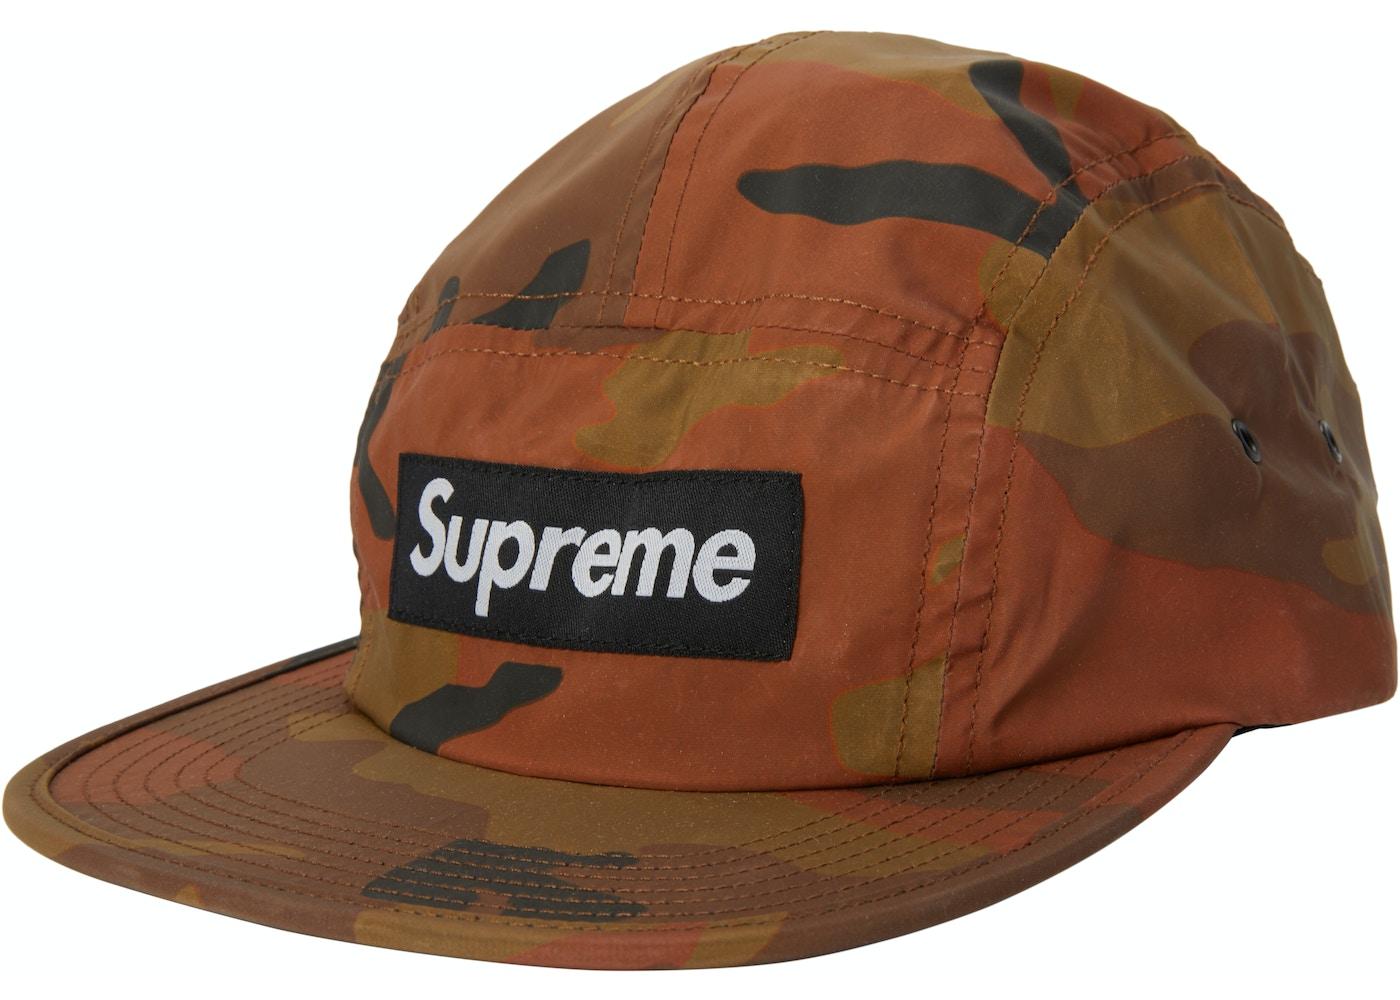 Buy   Sell Supreme Streetwear - New Lowest Asks 326499c6febb